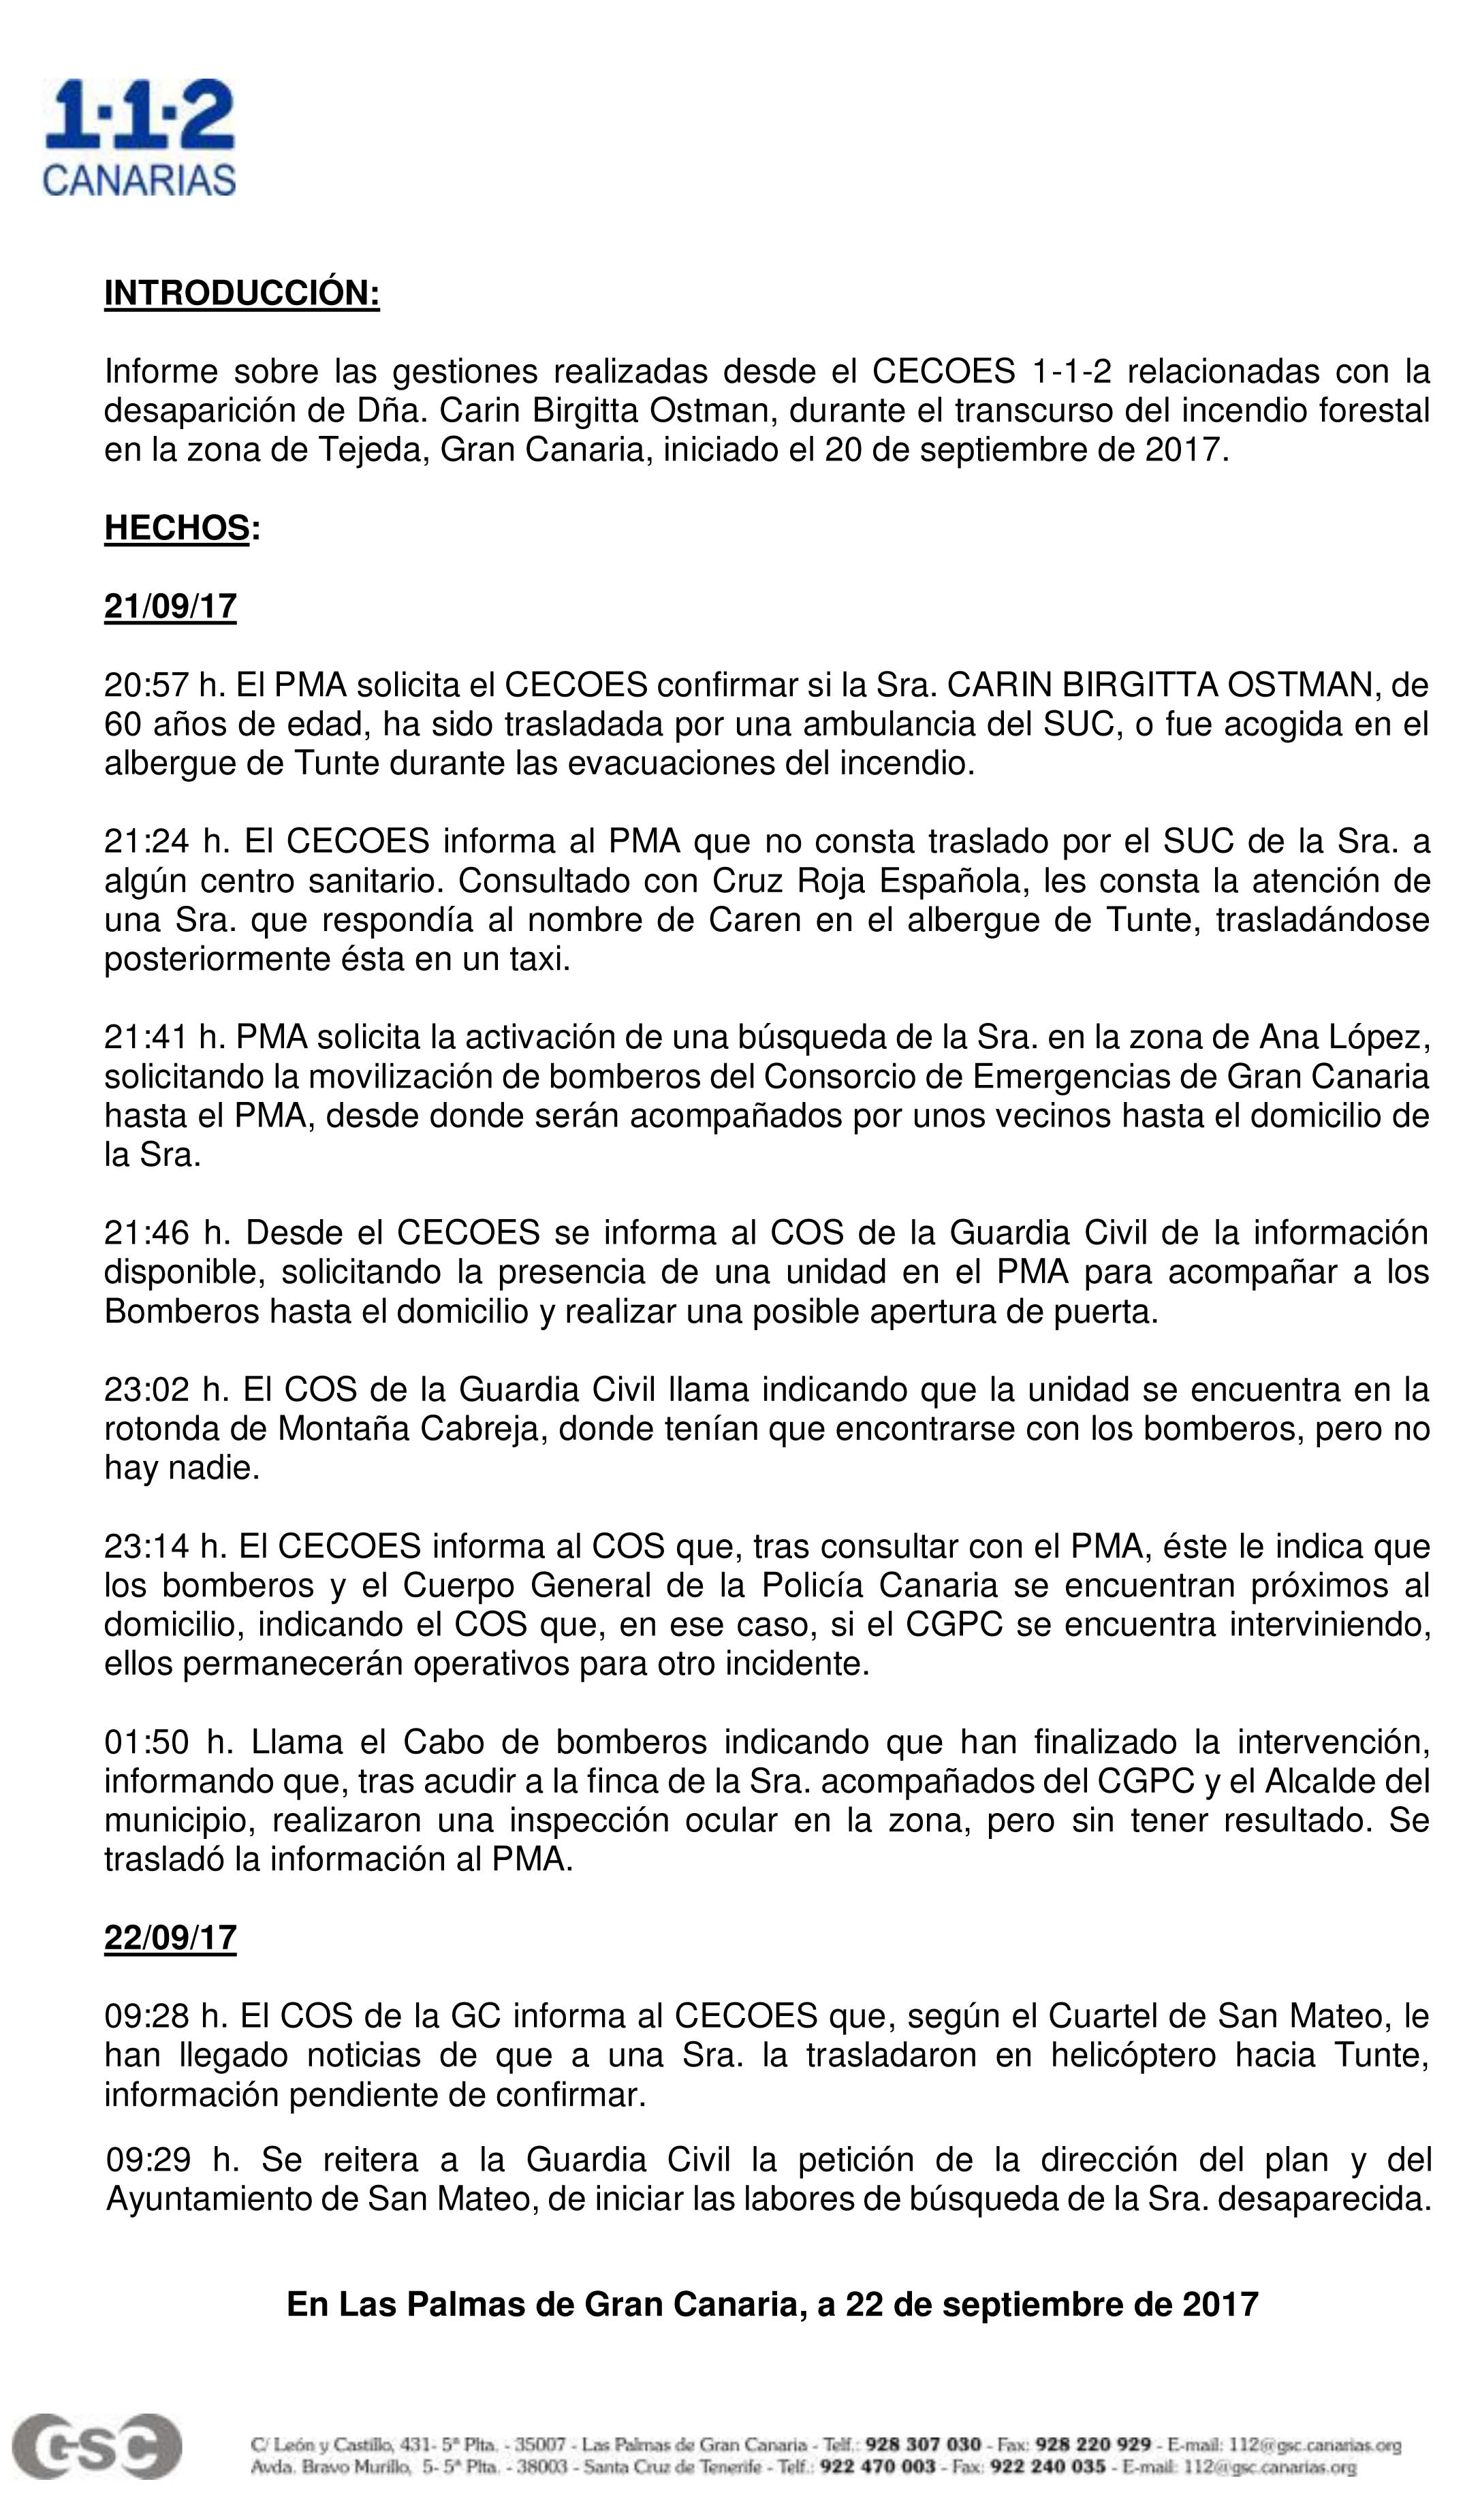 Documento 112 Busqueda Carin Birgitta